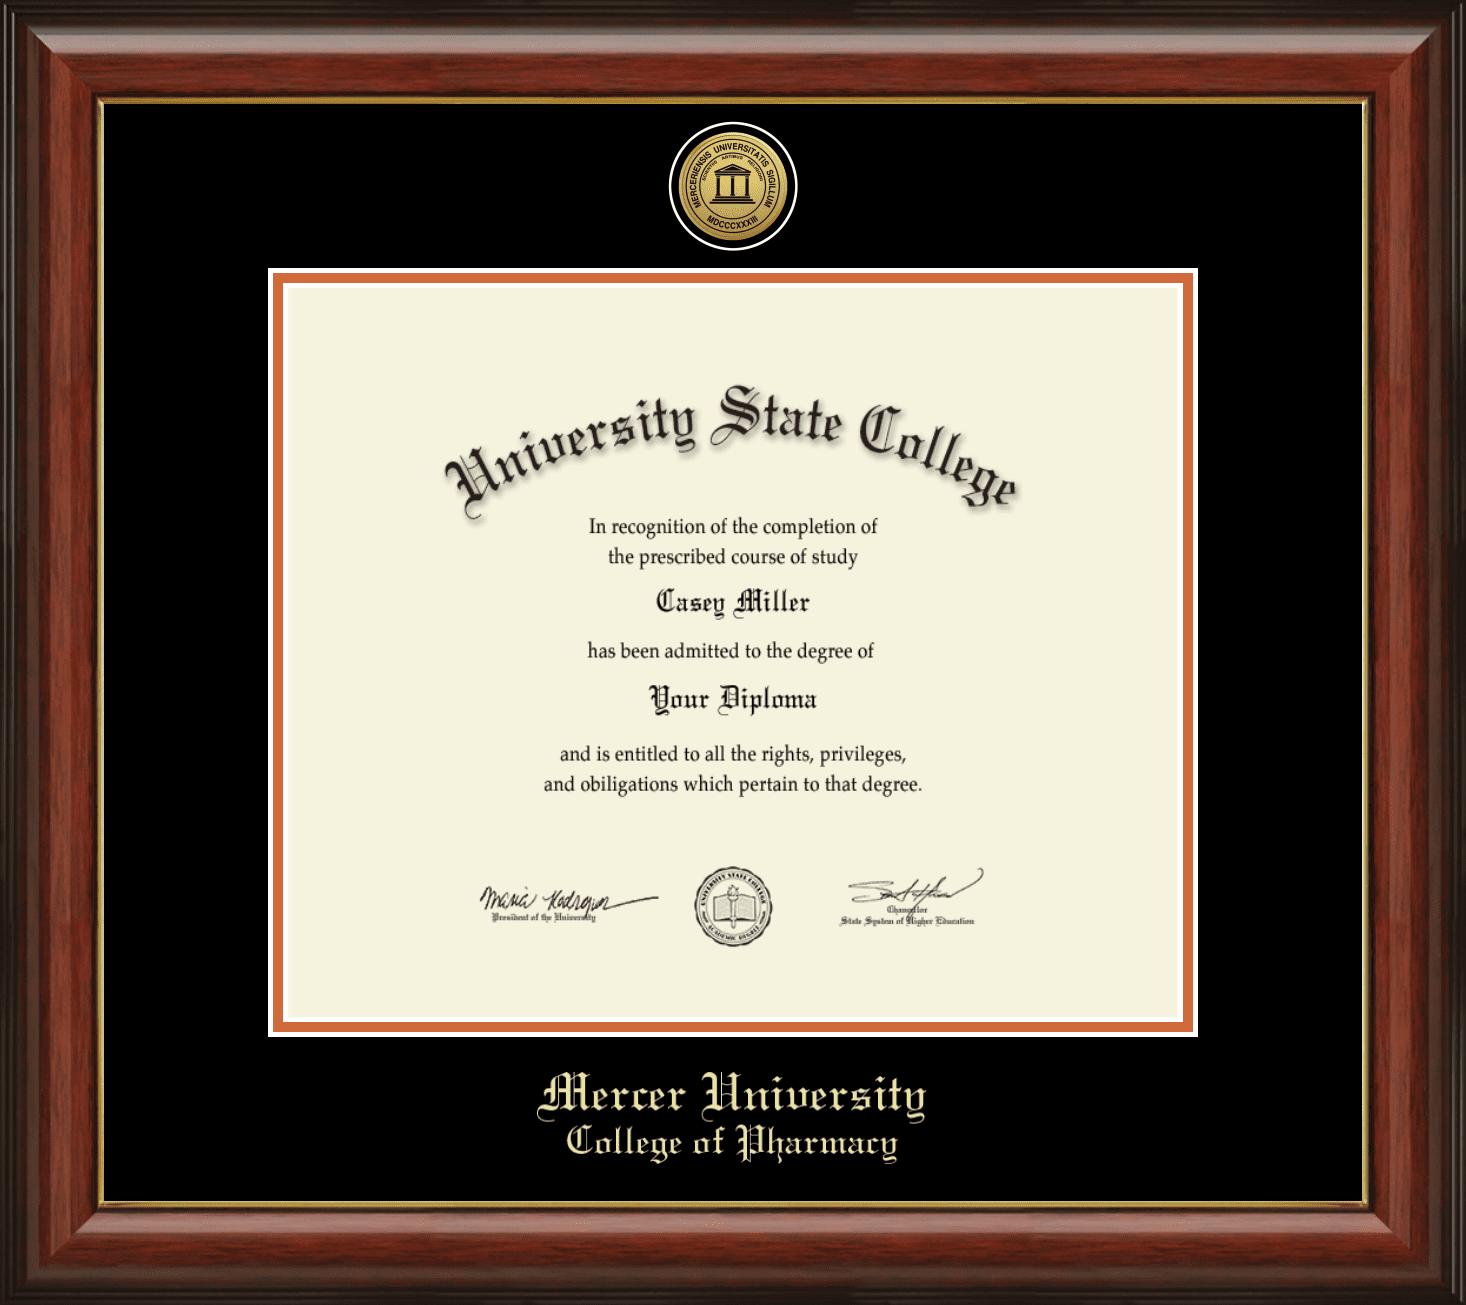 Mercer University College Of Pharmacy Officially Licensed Gold Printed Medallion Diploma Frame Diploma Size 17 X 14 Walmart Com Walmart Com